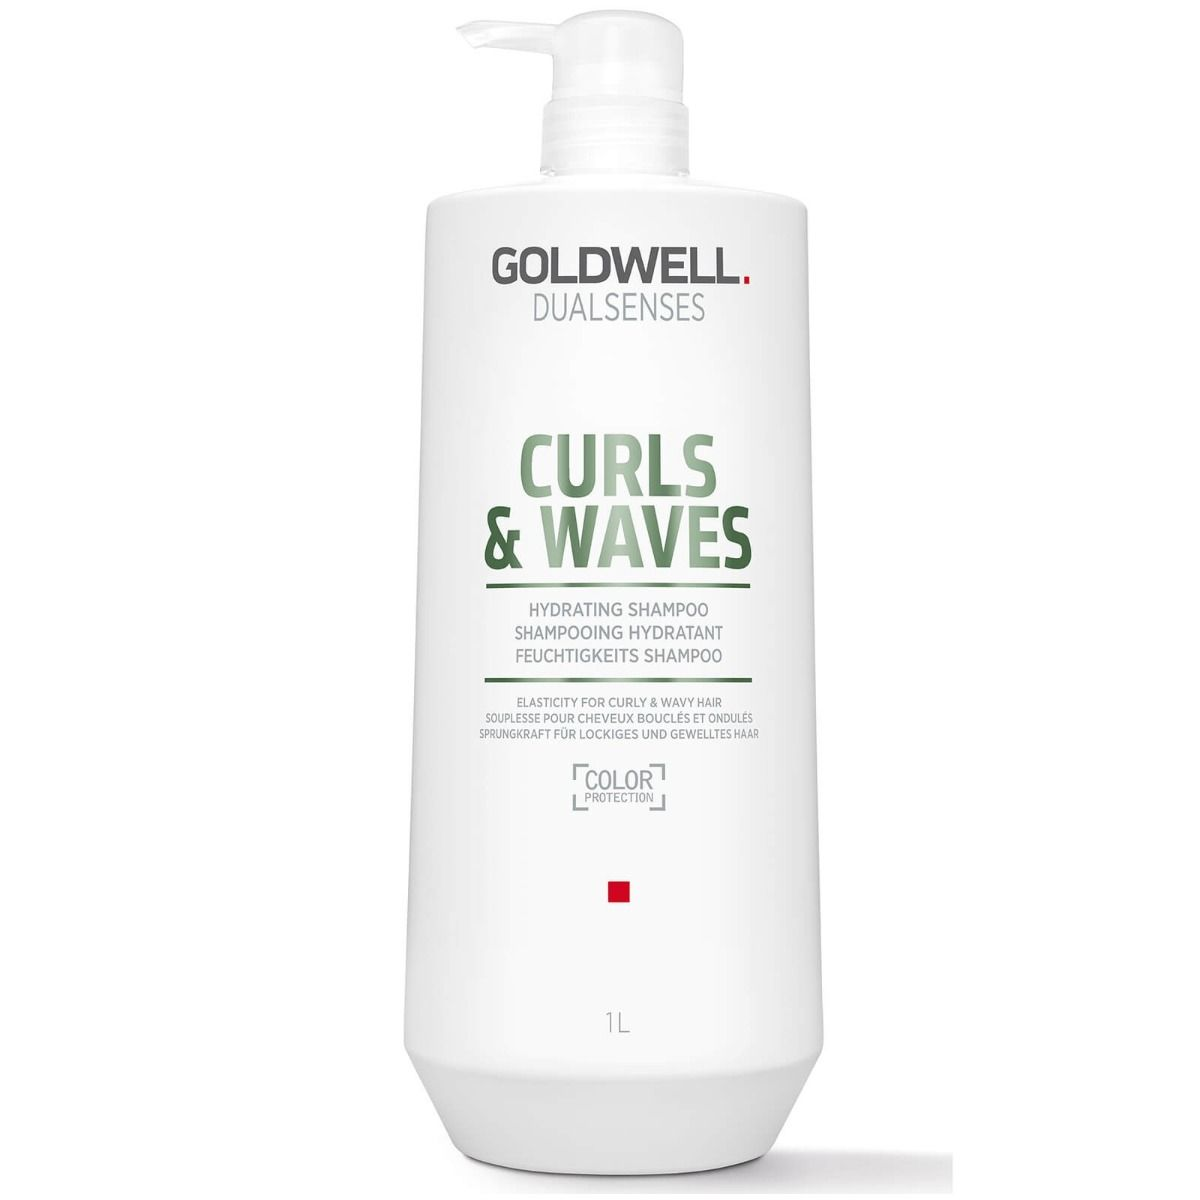 Goldwell Dualsense - Curl & Waves Shampoo 1000ml